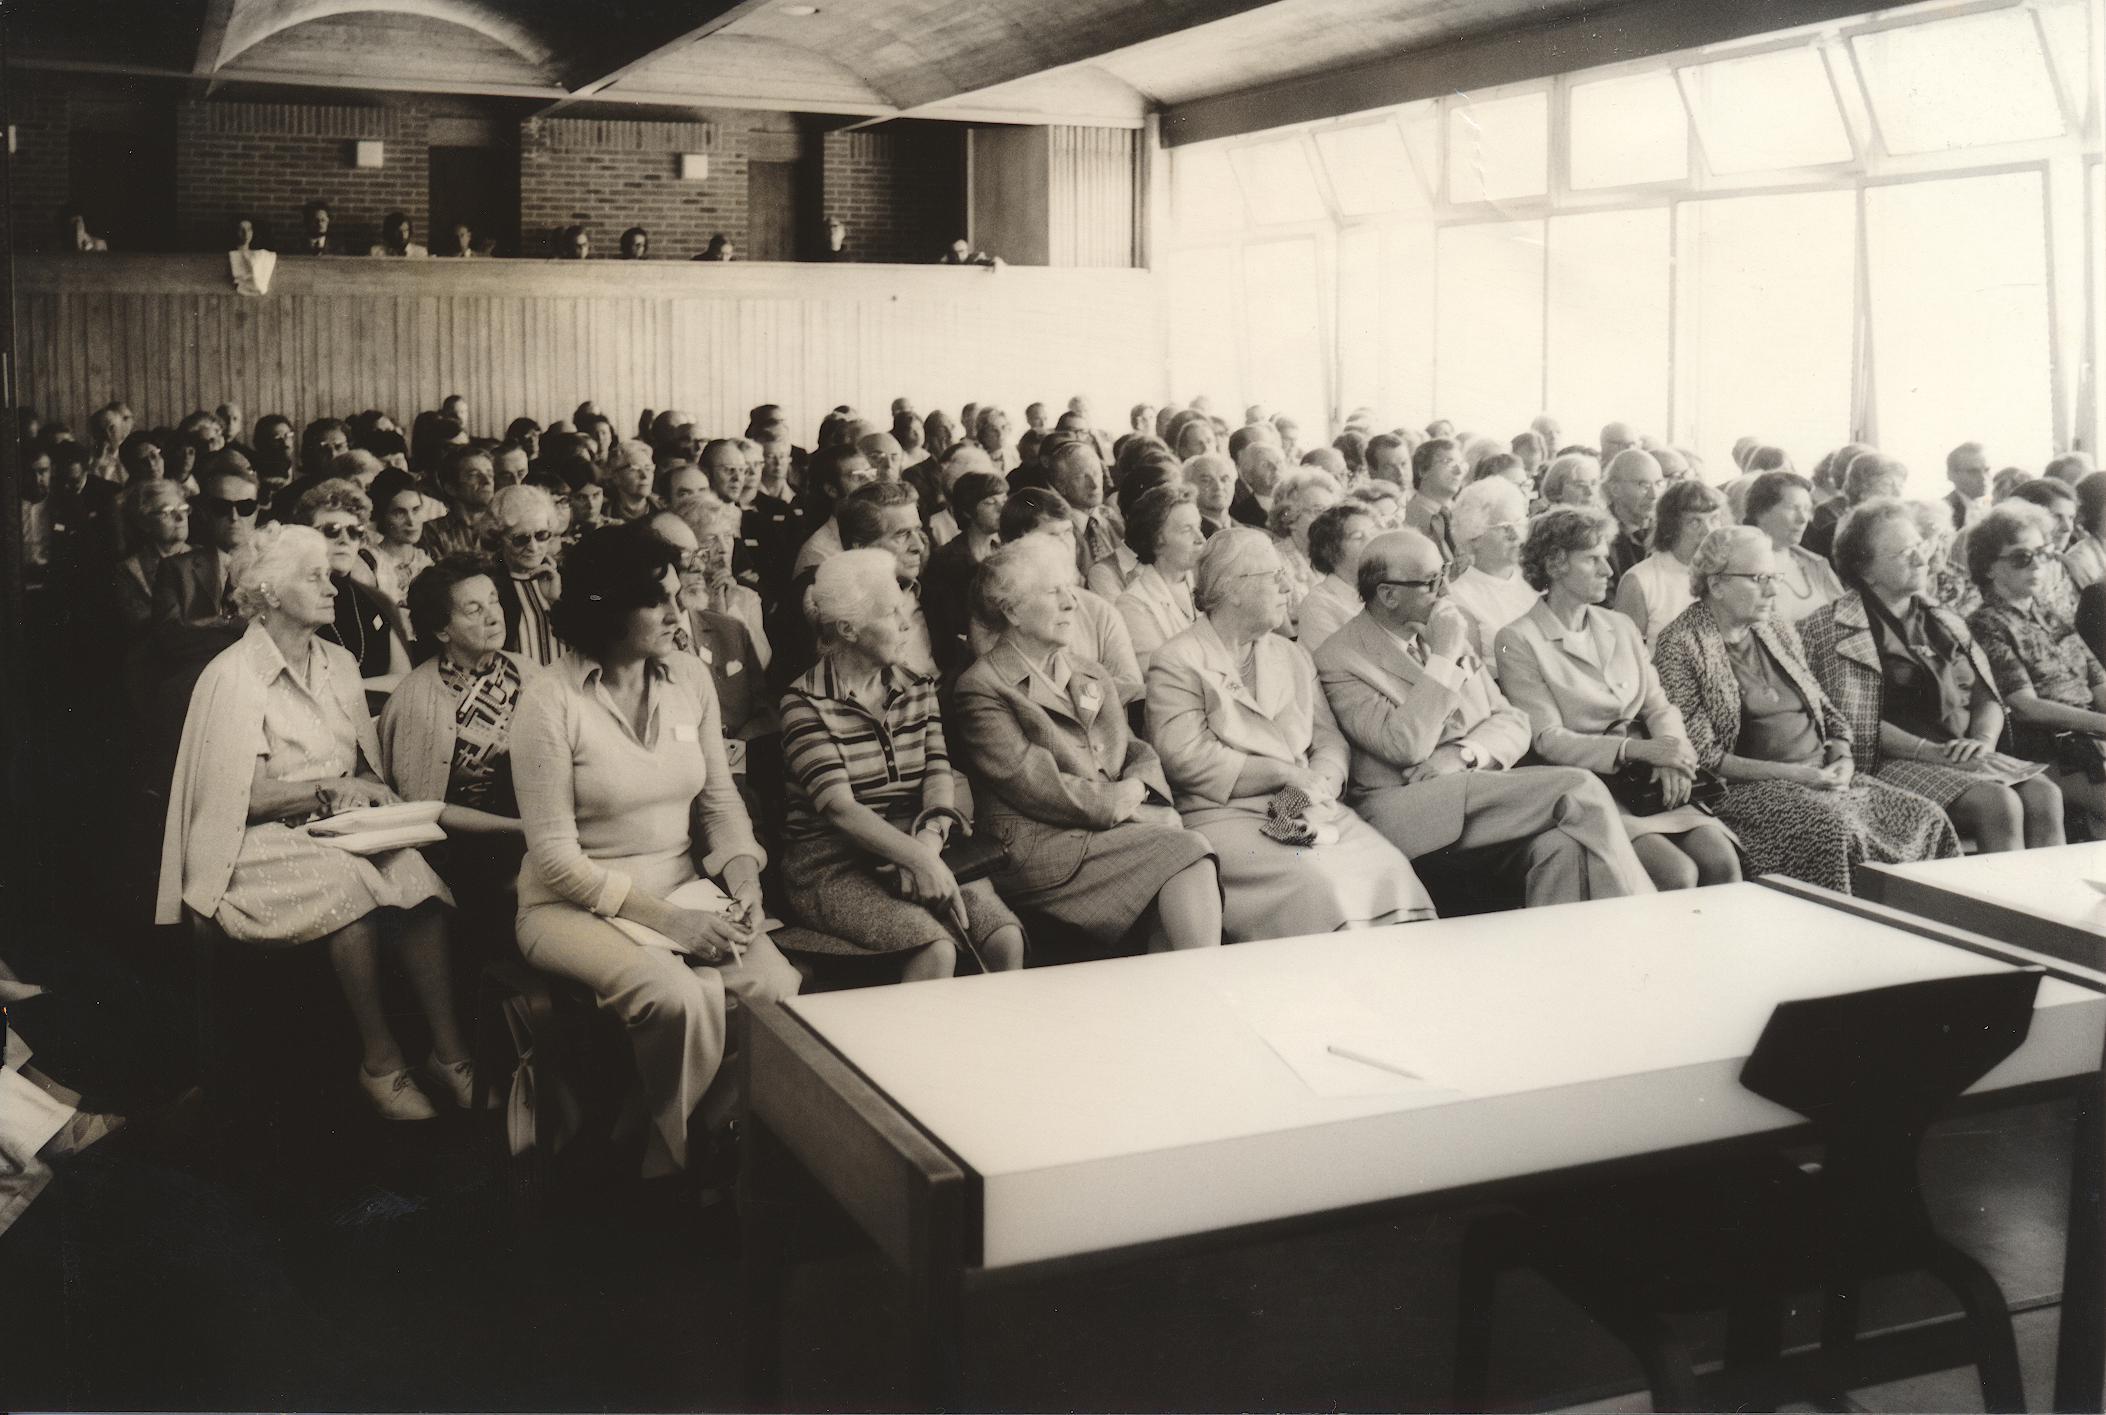 V. Internat. Imago Mundi-Kongress 1974, Cusanus Akademie, Brixen, Teilnehmerfoto